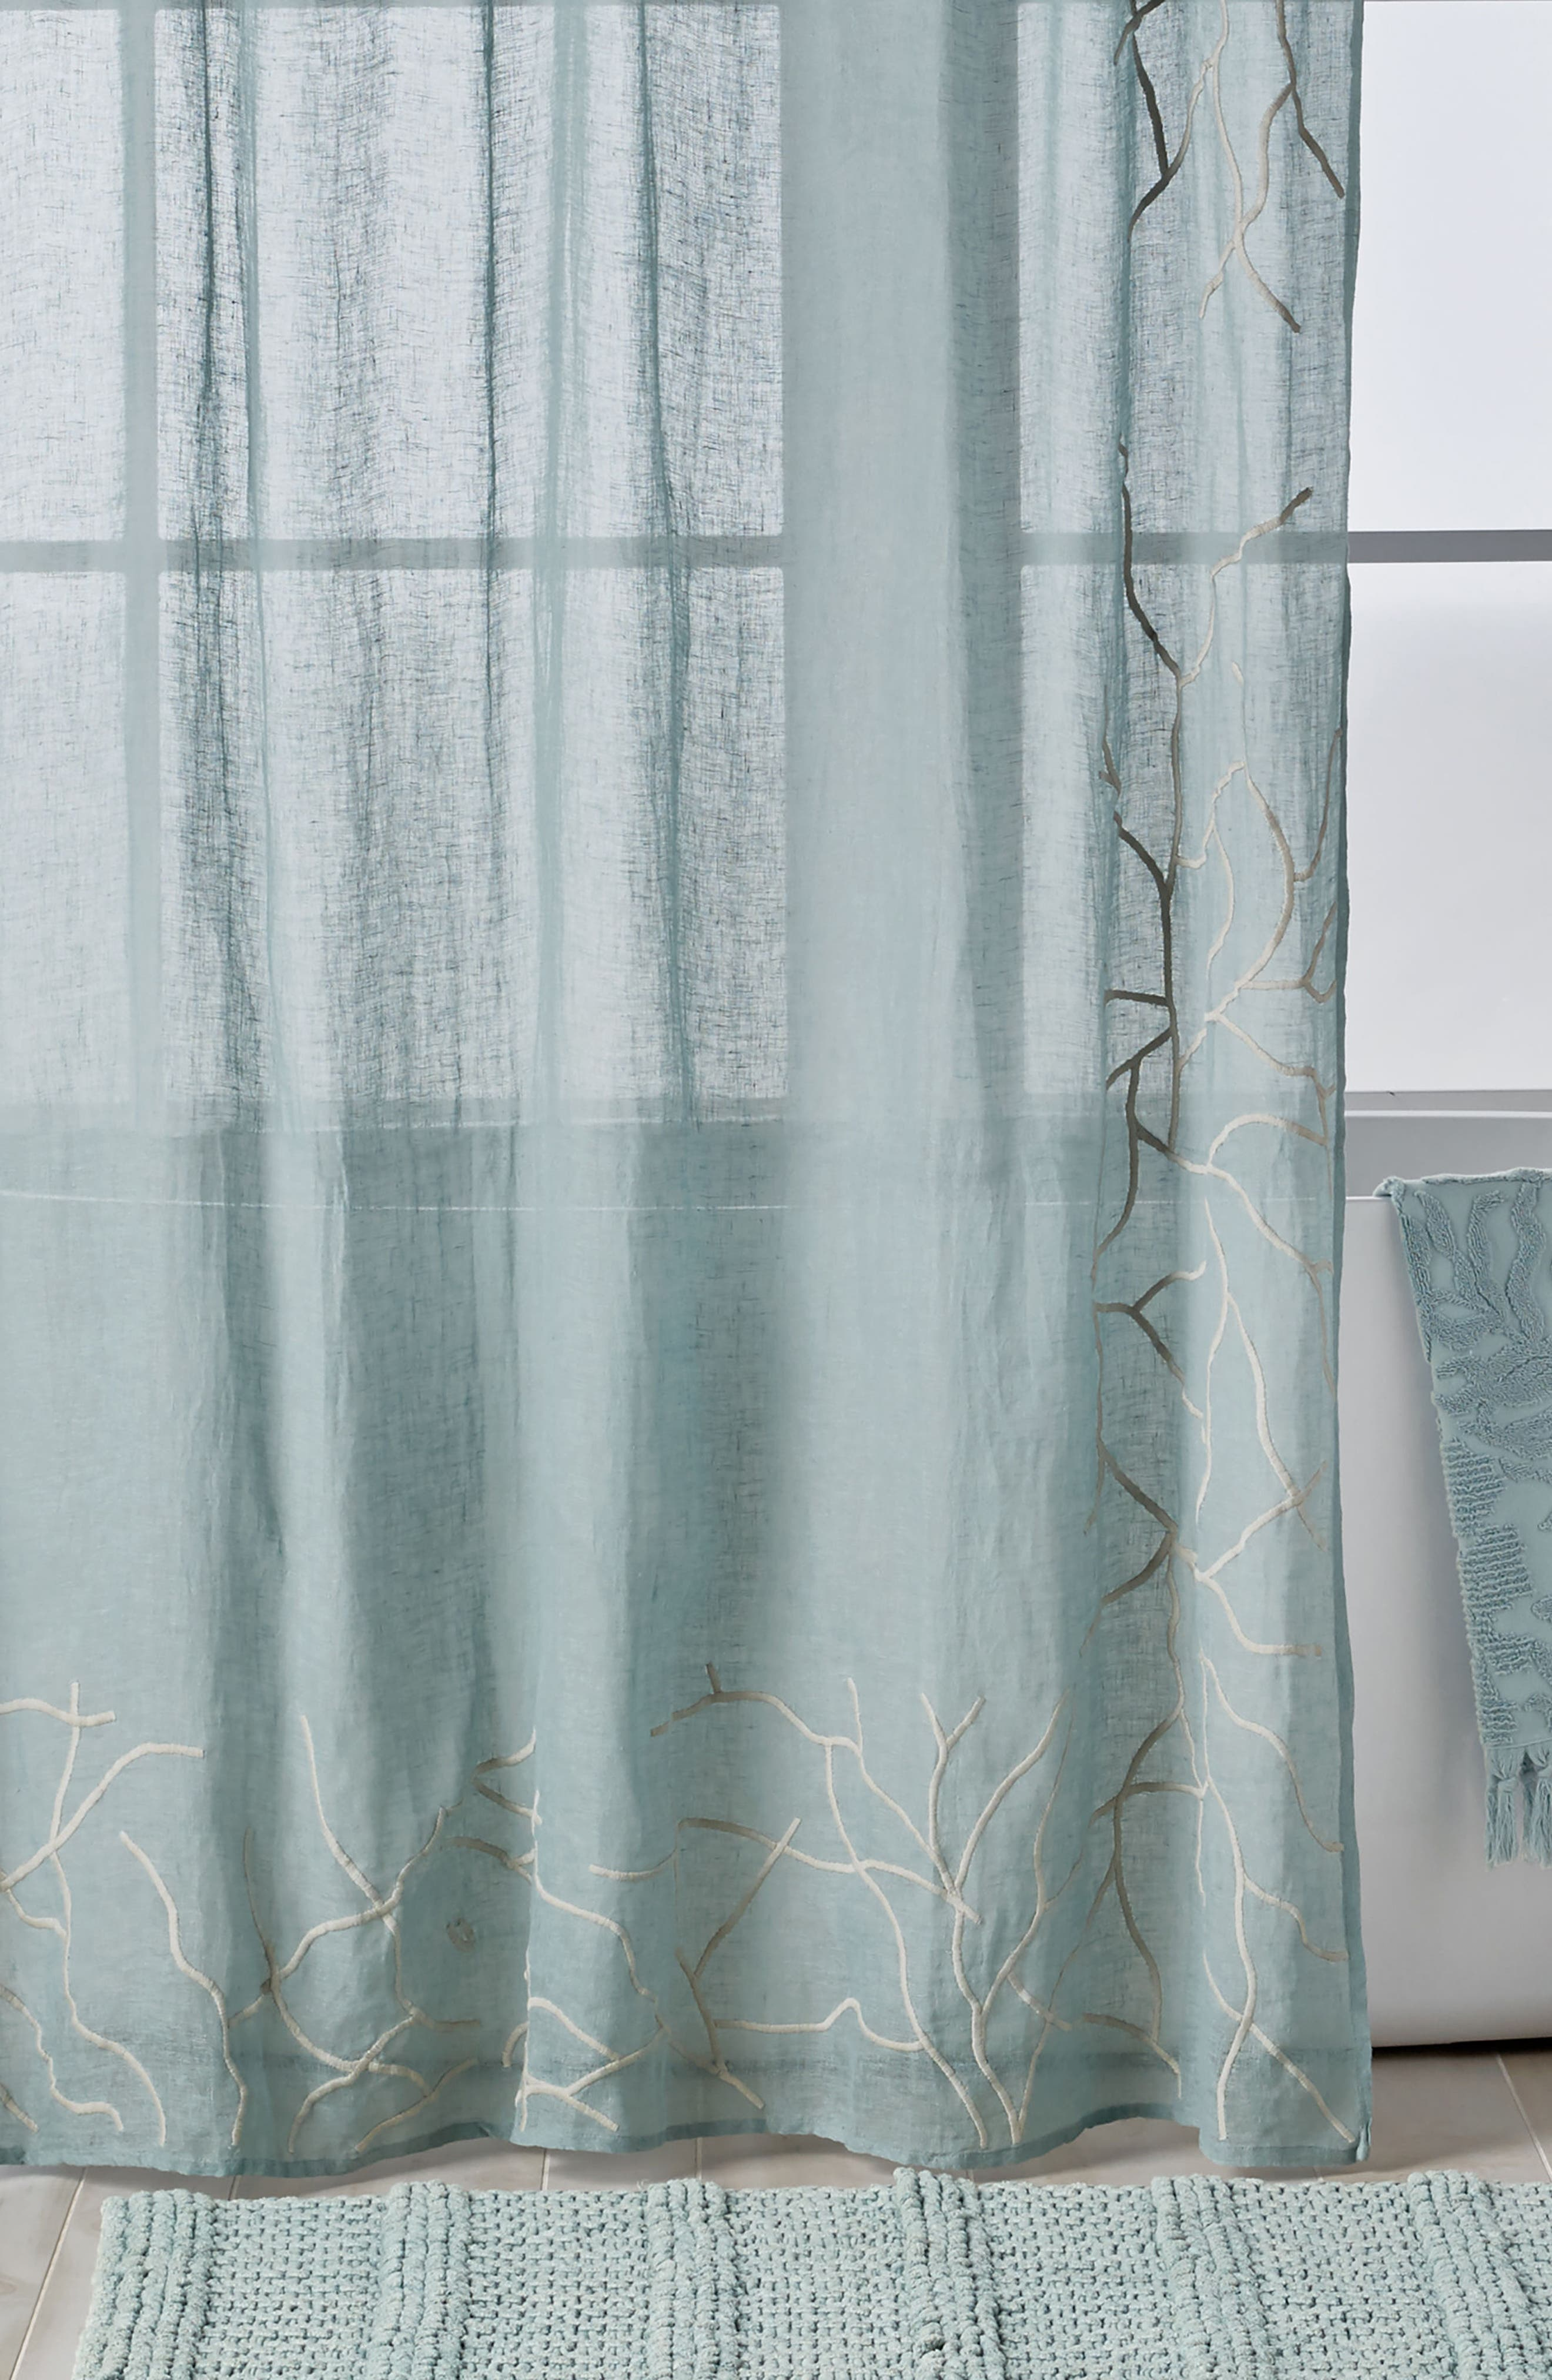 MICHAEL ARAM Ocean Reef Shower Curtain, Main, color, SEAFOAM